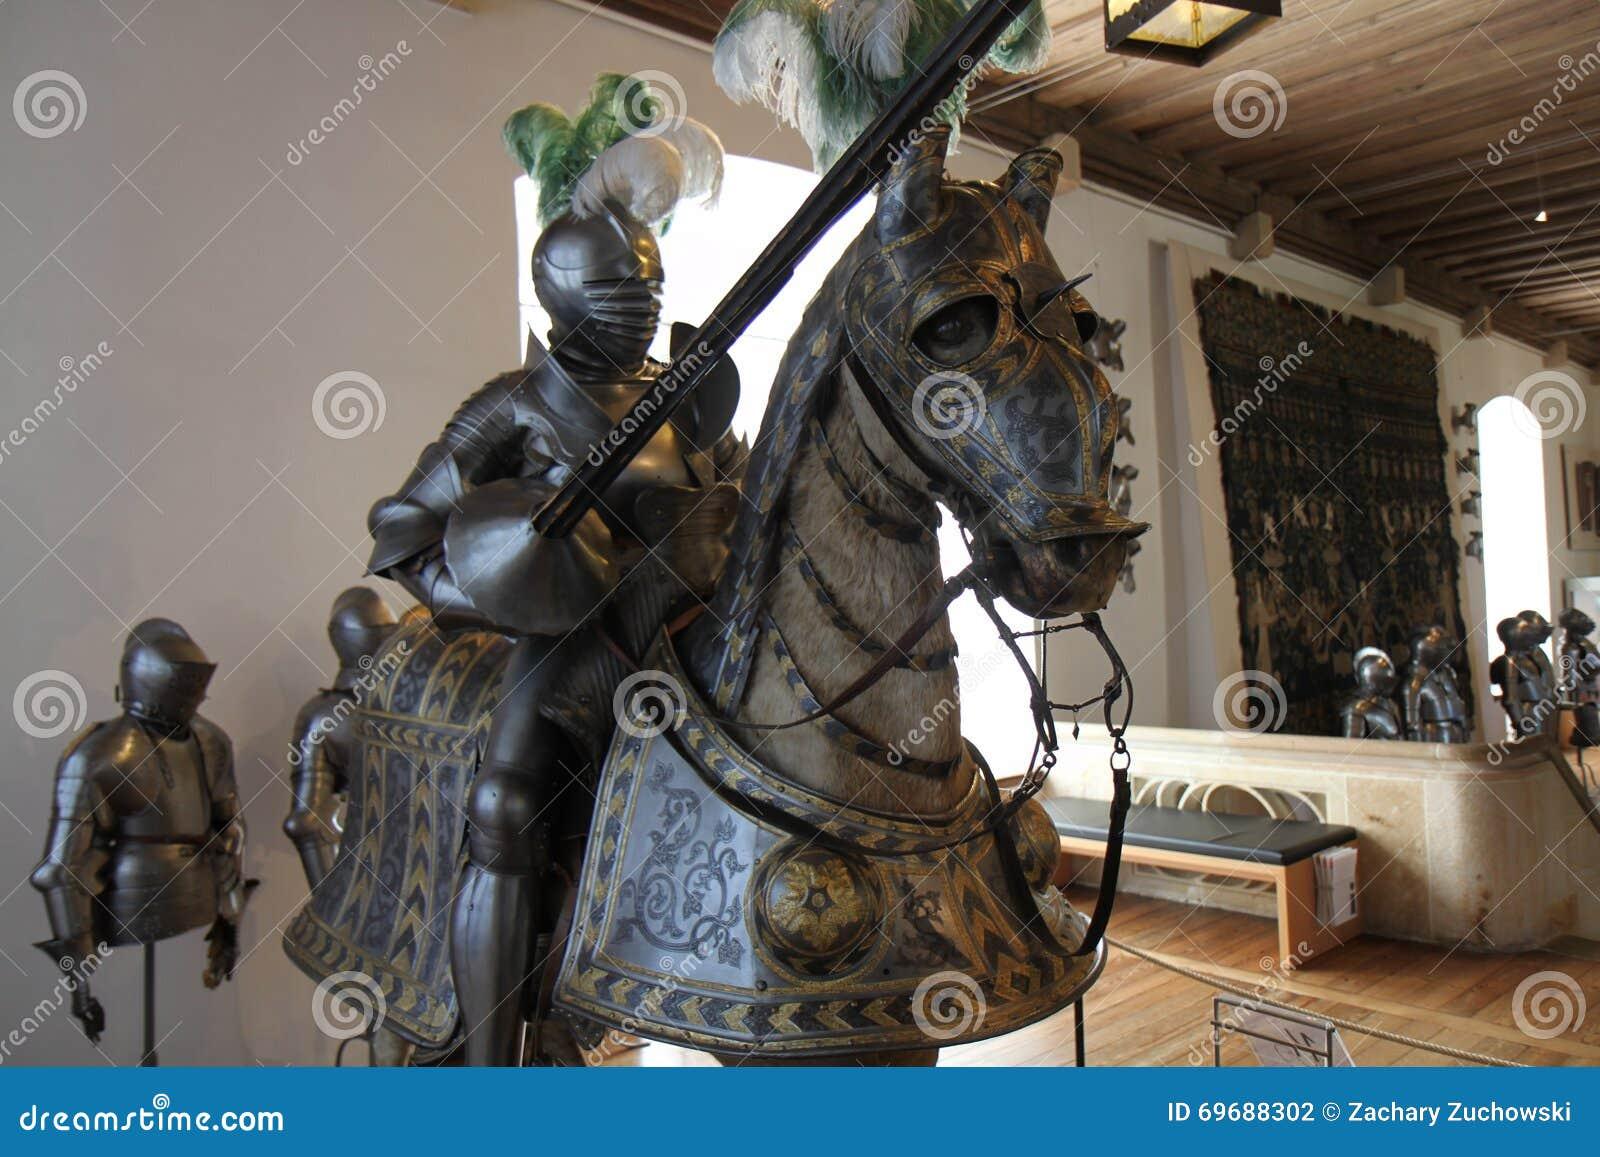 Knight панцырь биться панцырь пики и лошади